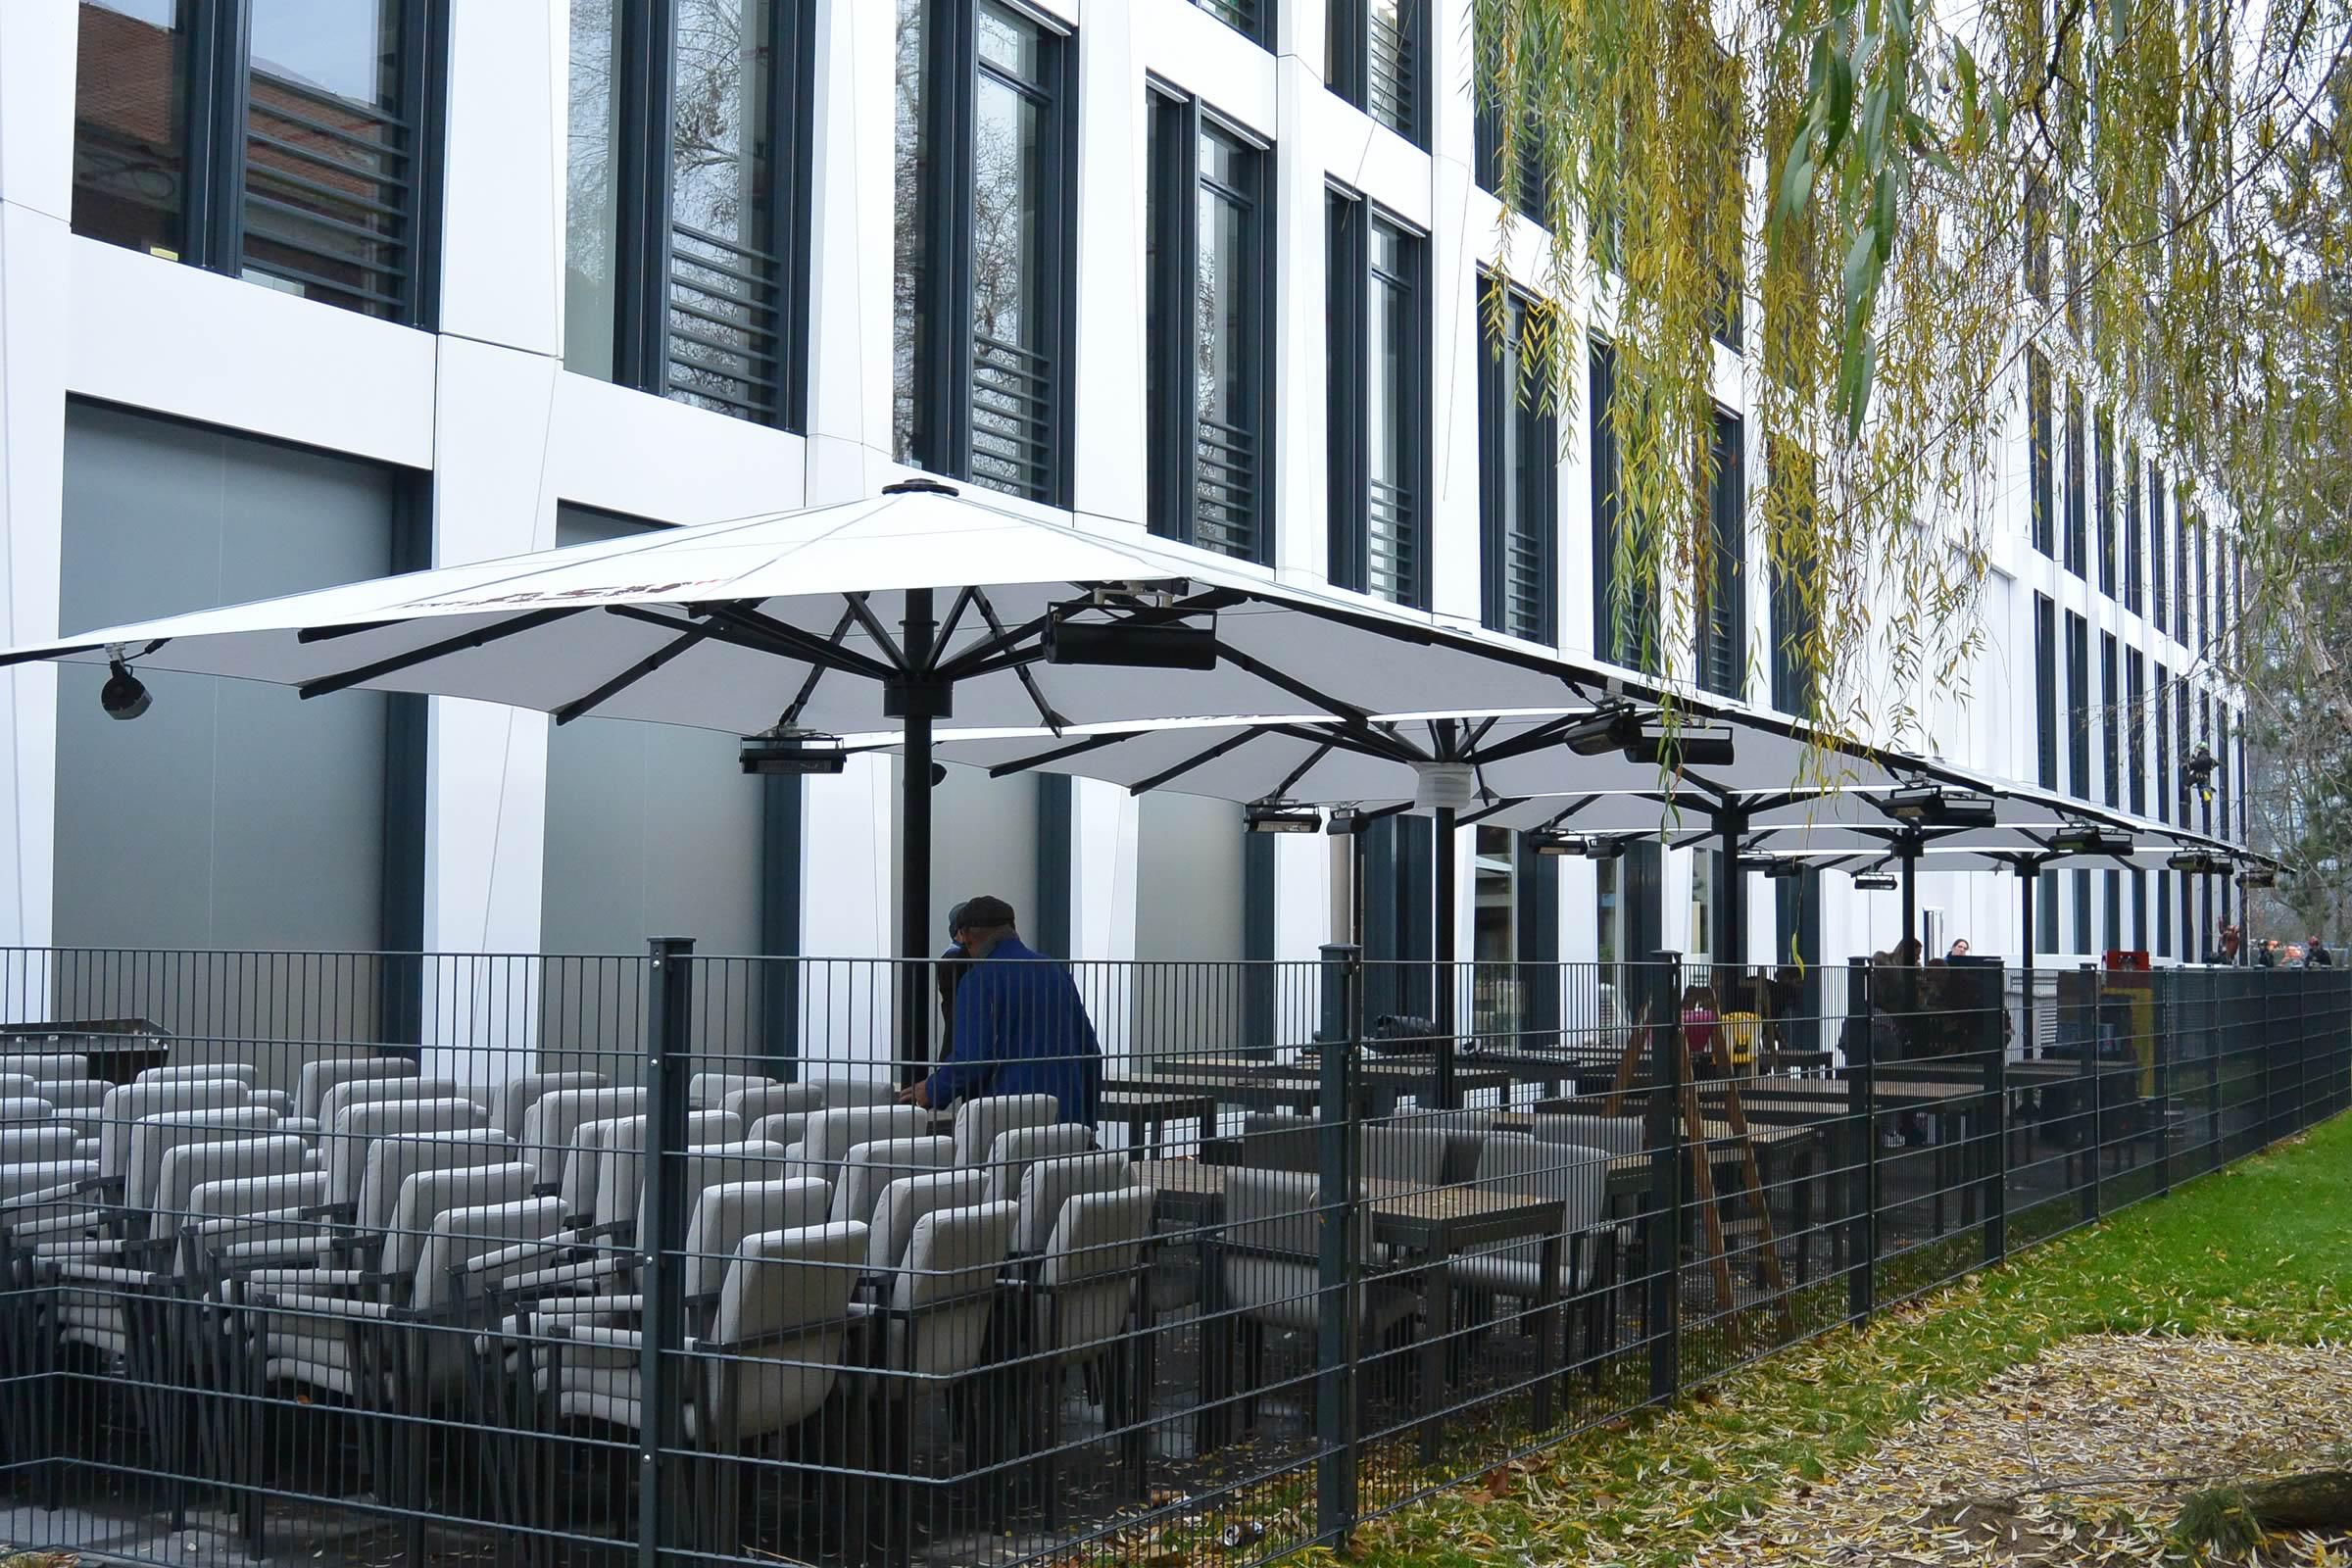 FRANZ-AACHEN GmbH Schirme